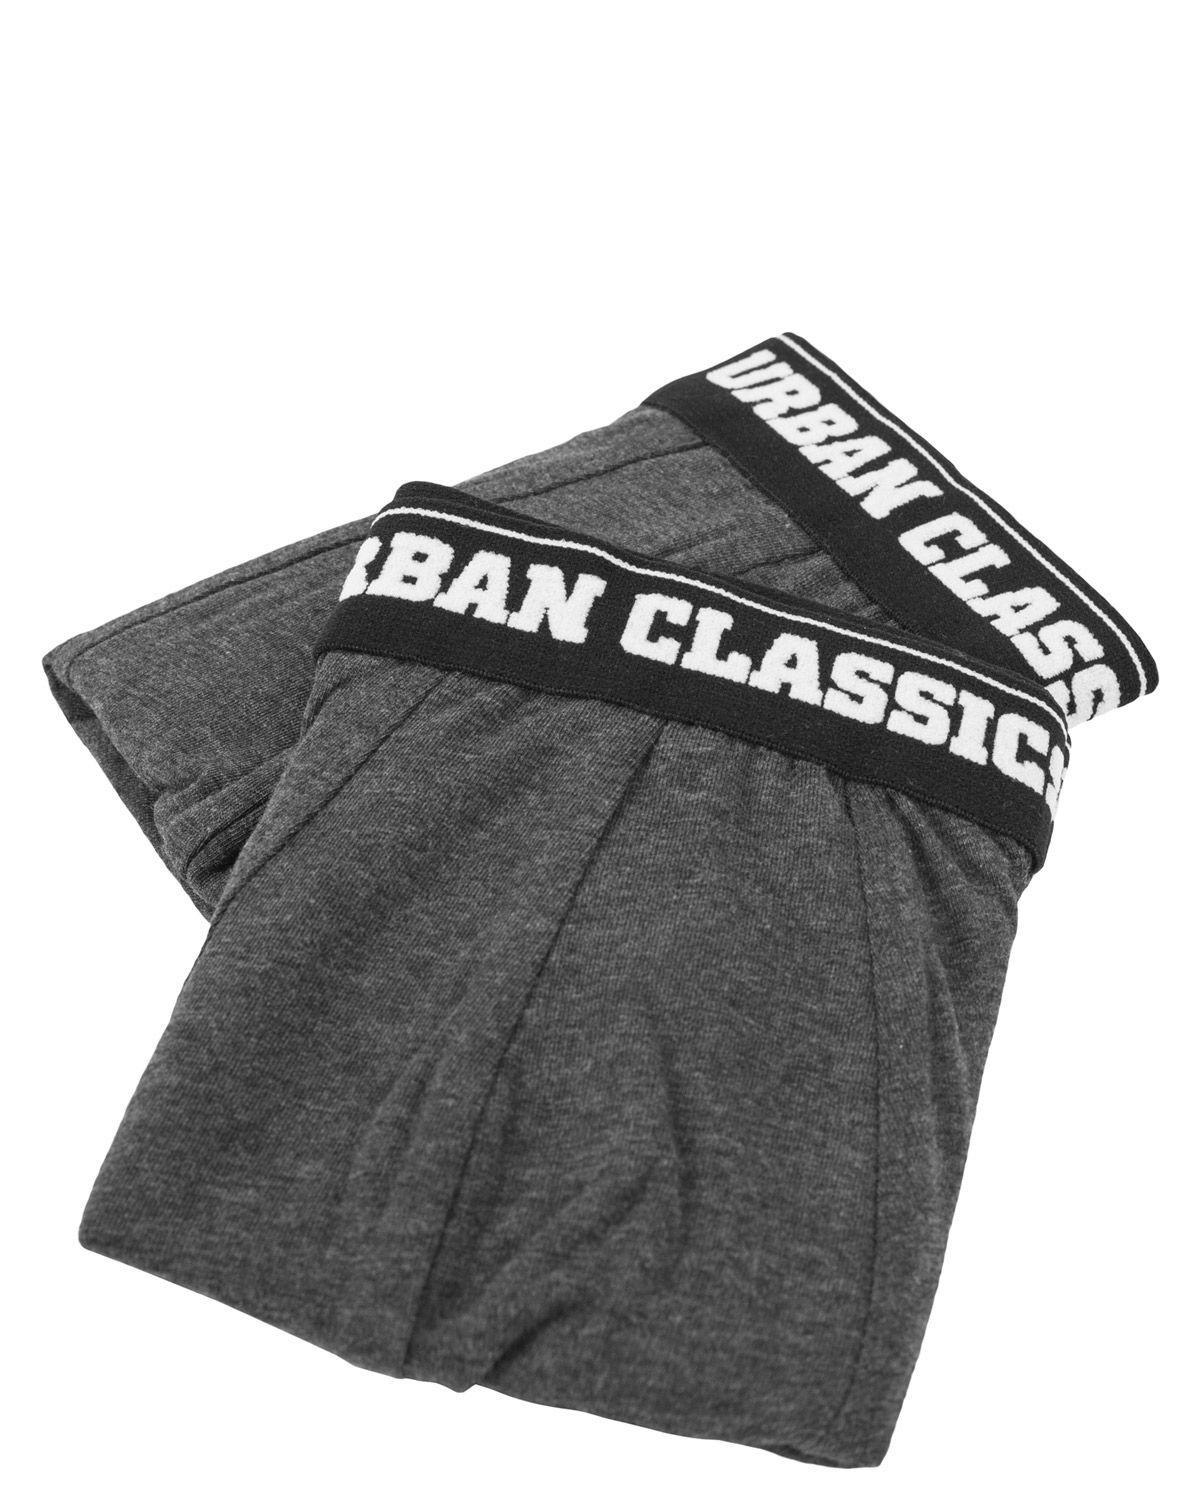 Image of   Urban Classics Boxershorts (Charcoal, L)